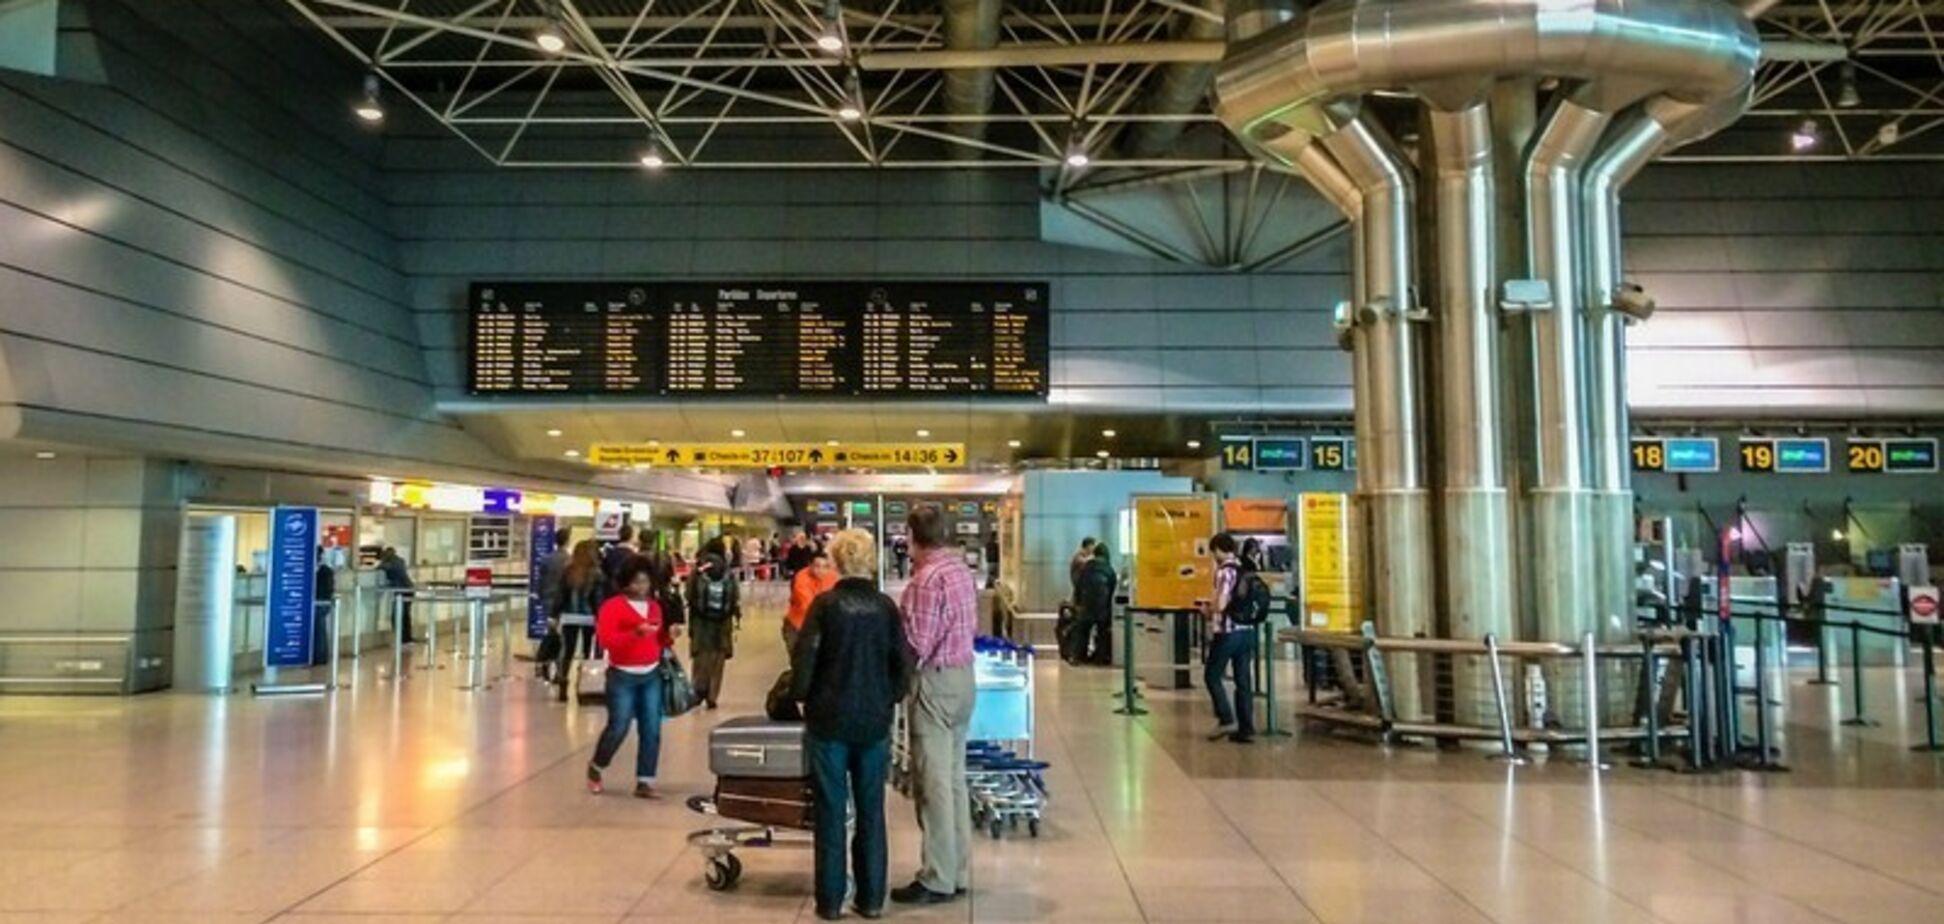 Аеропорт Лісабона в Португалії